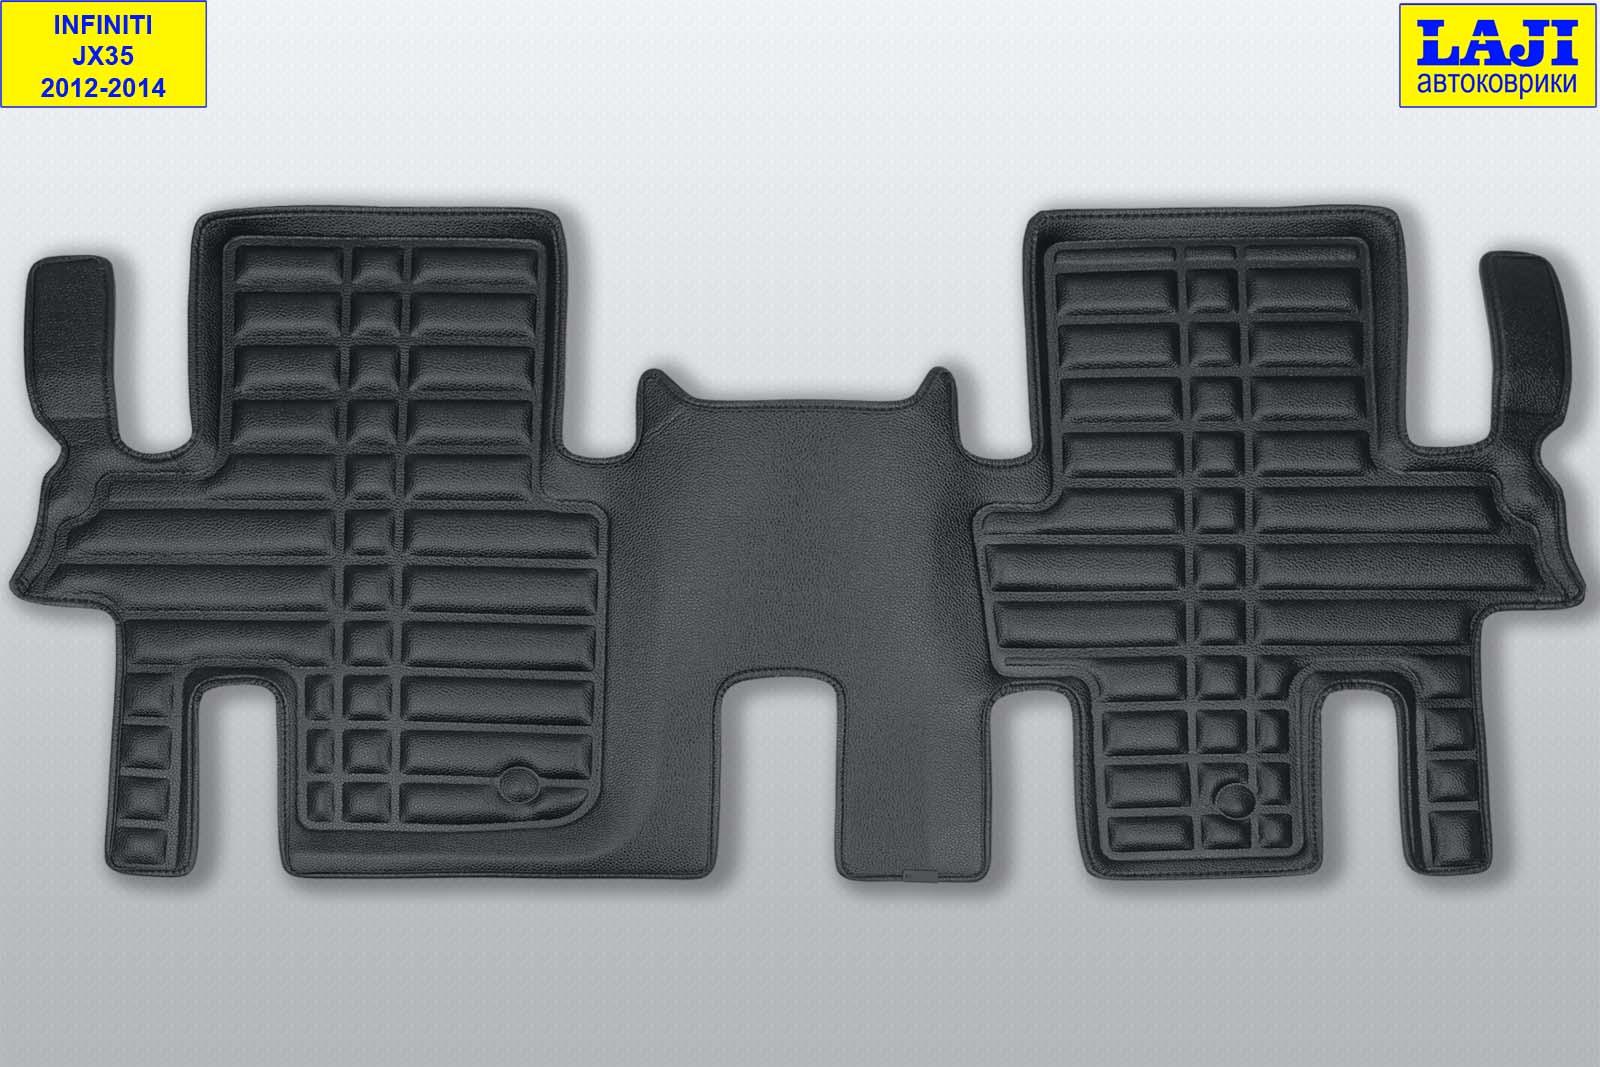 5D коврики в салон Infiniti JX35 2012-2014 10